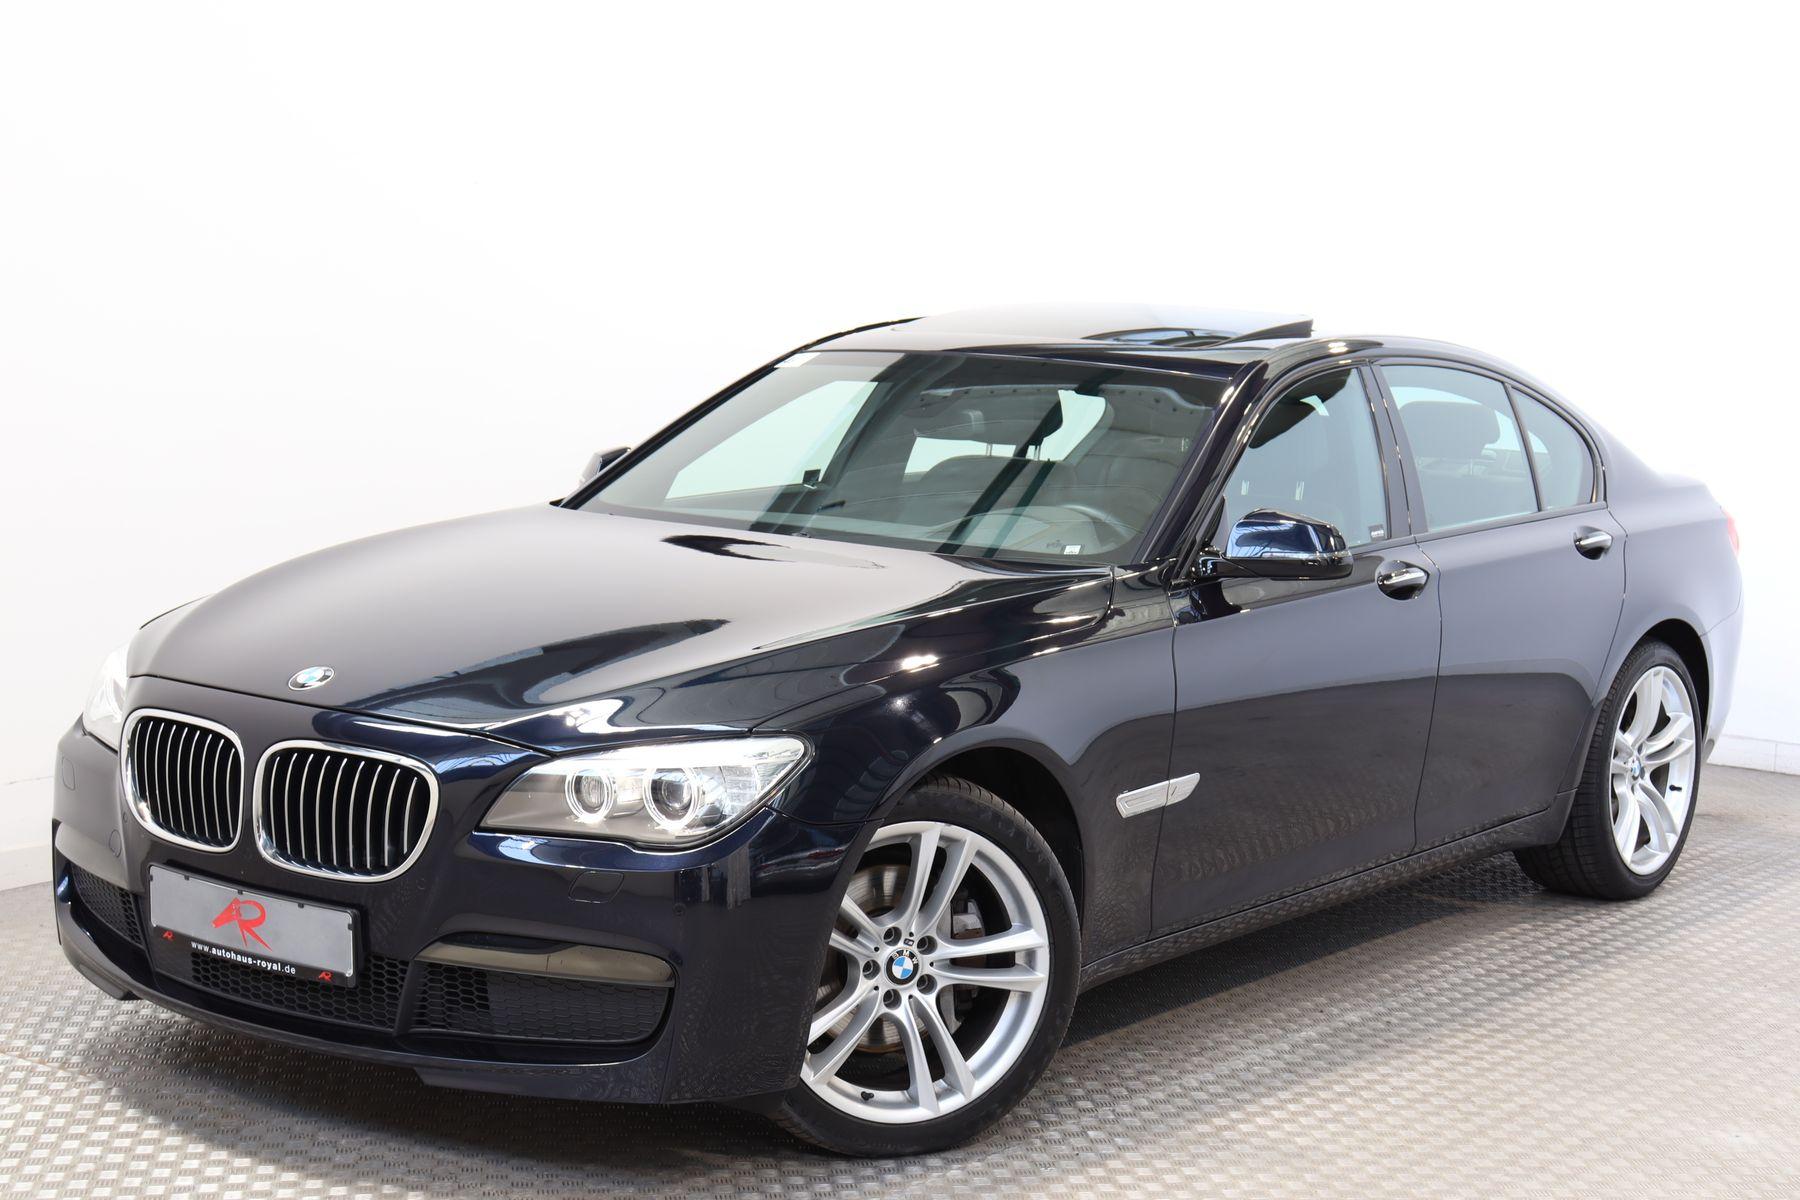 BMW 730 d xDrive M SPORT DIG.TACHO,STANDHZ,SOFTCLOSE, Jahr 2012, Diesel